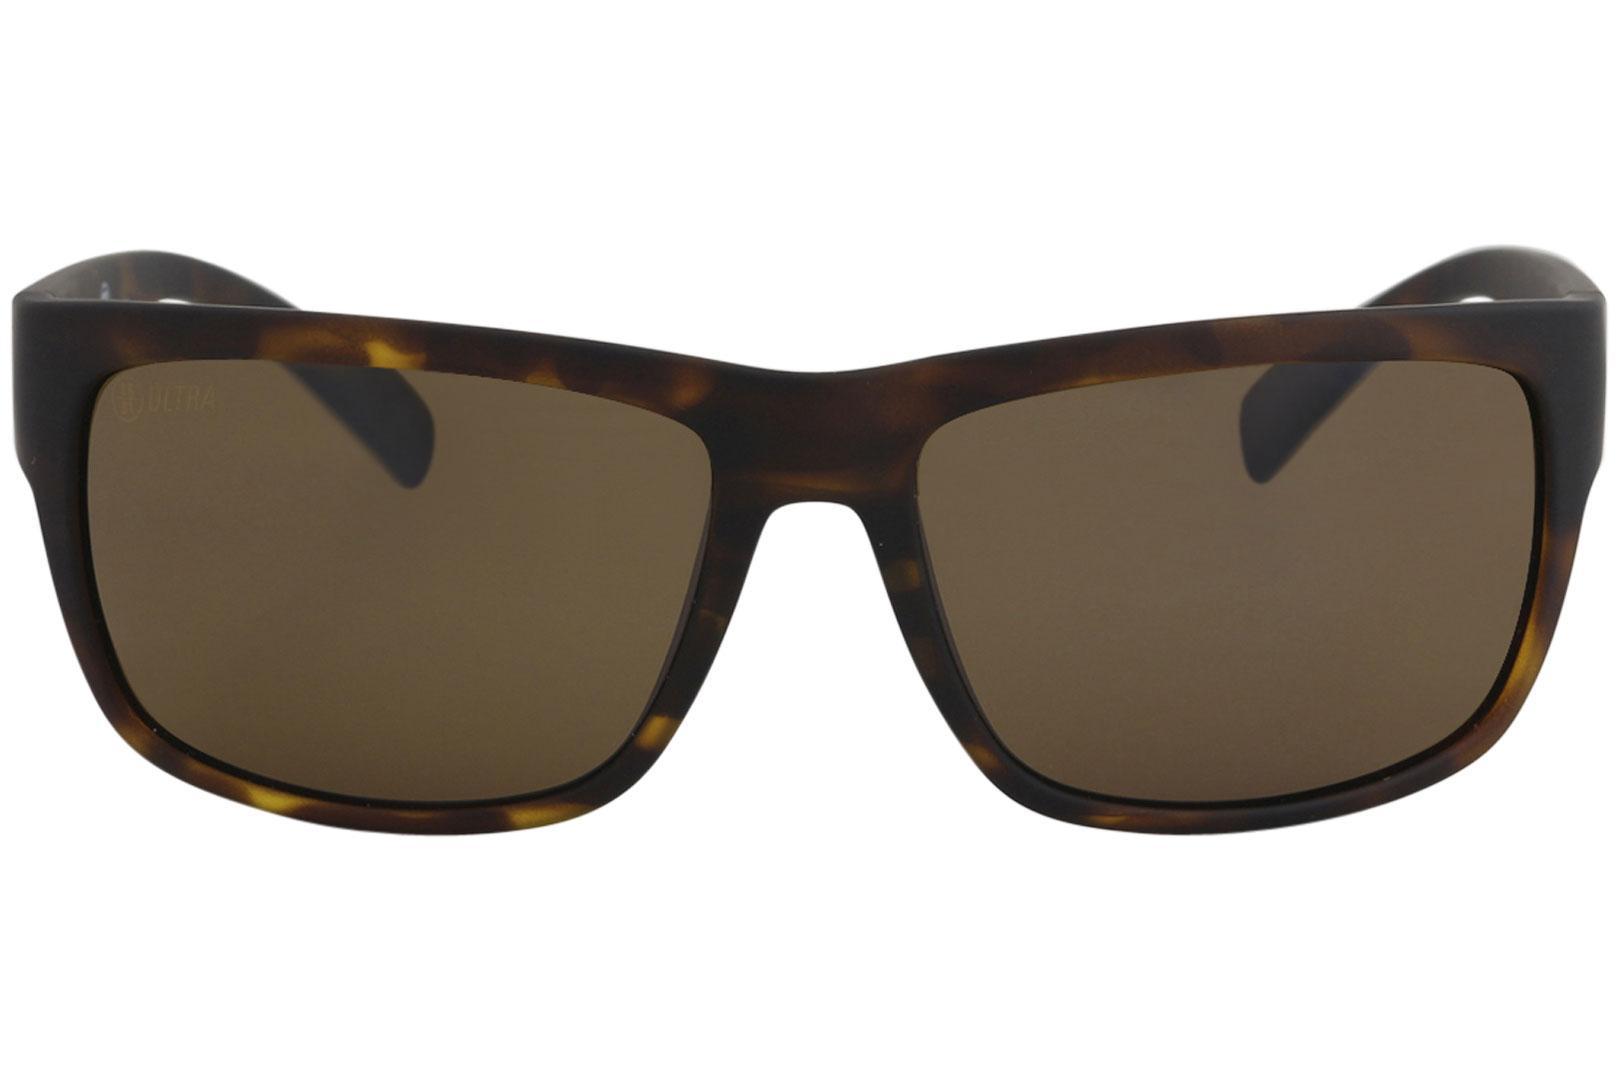 01d1ee57fe2 Kaenon Men s Redding Fashion Square Polarized Sunglasses by Kaenon